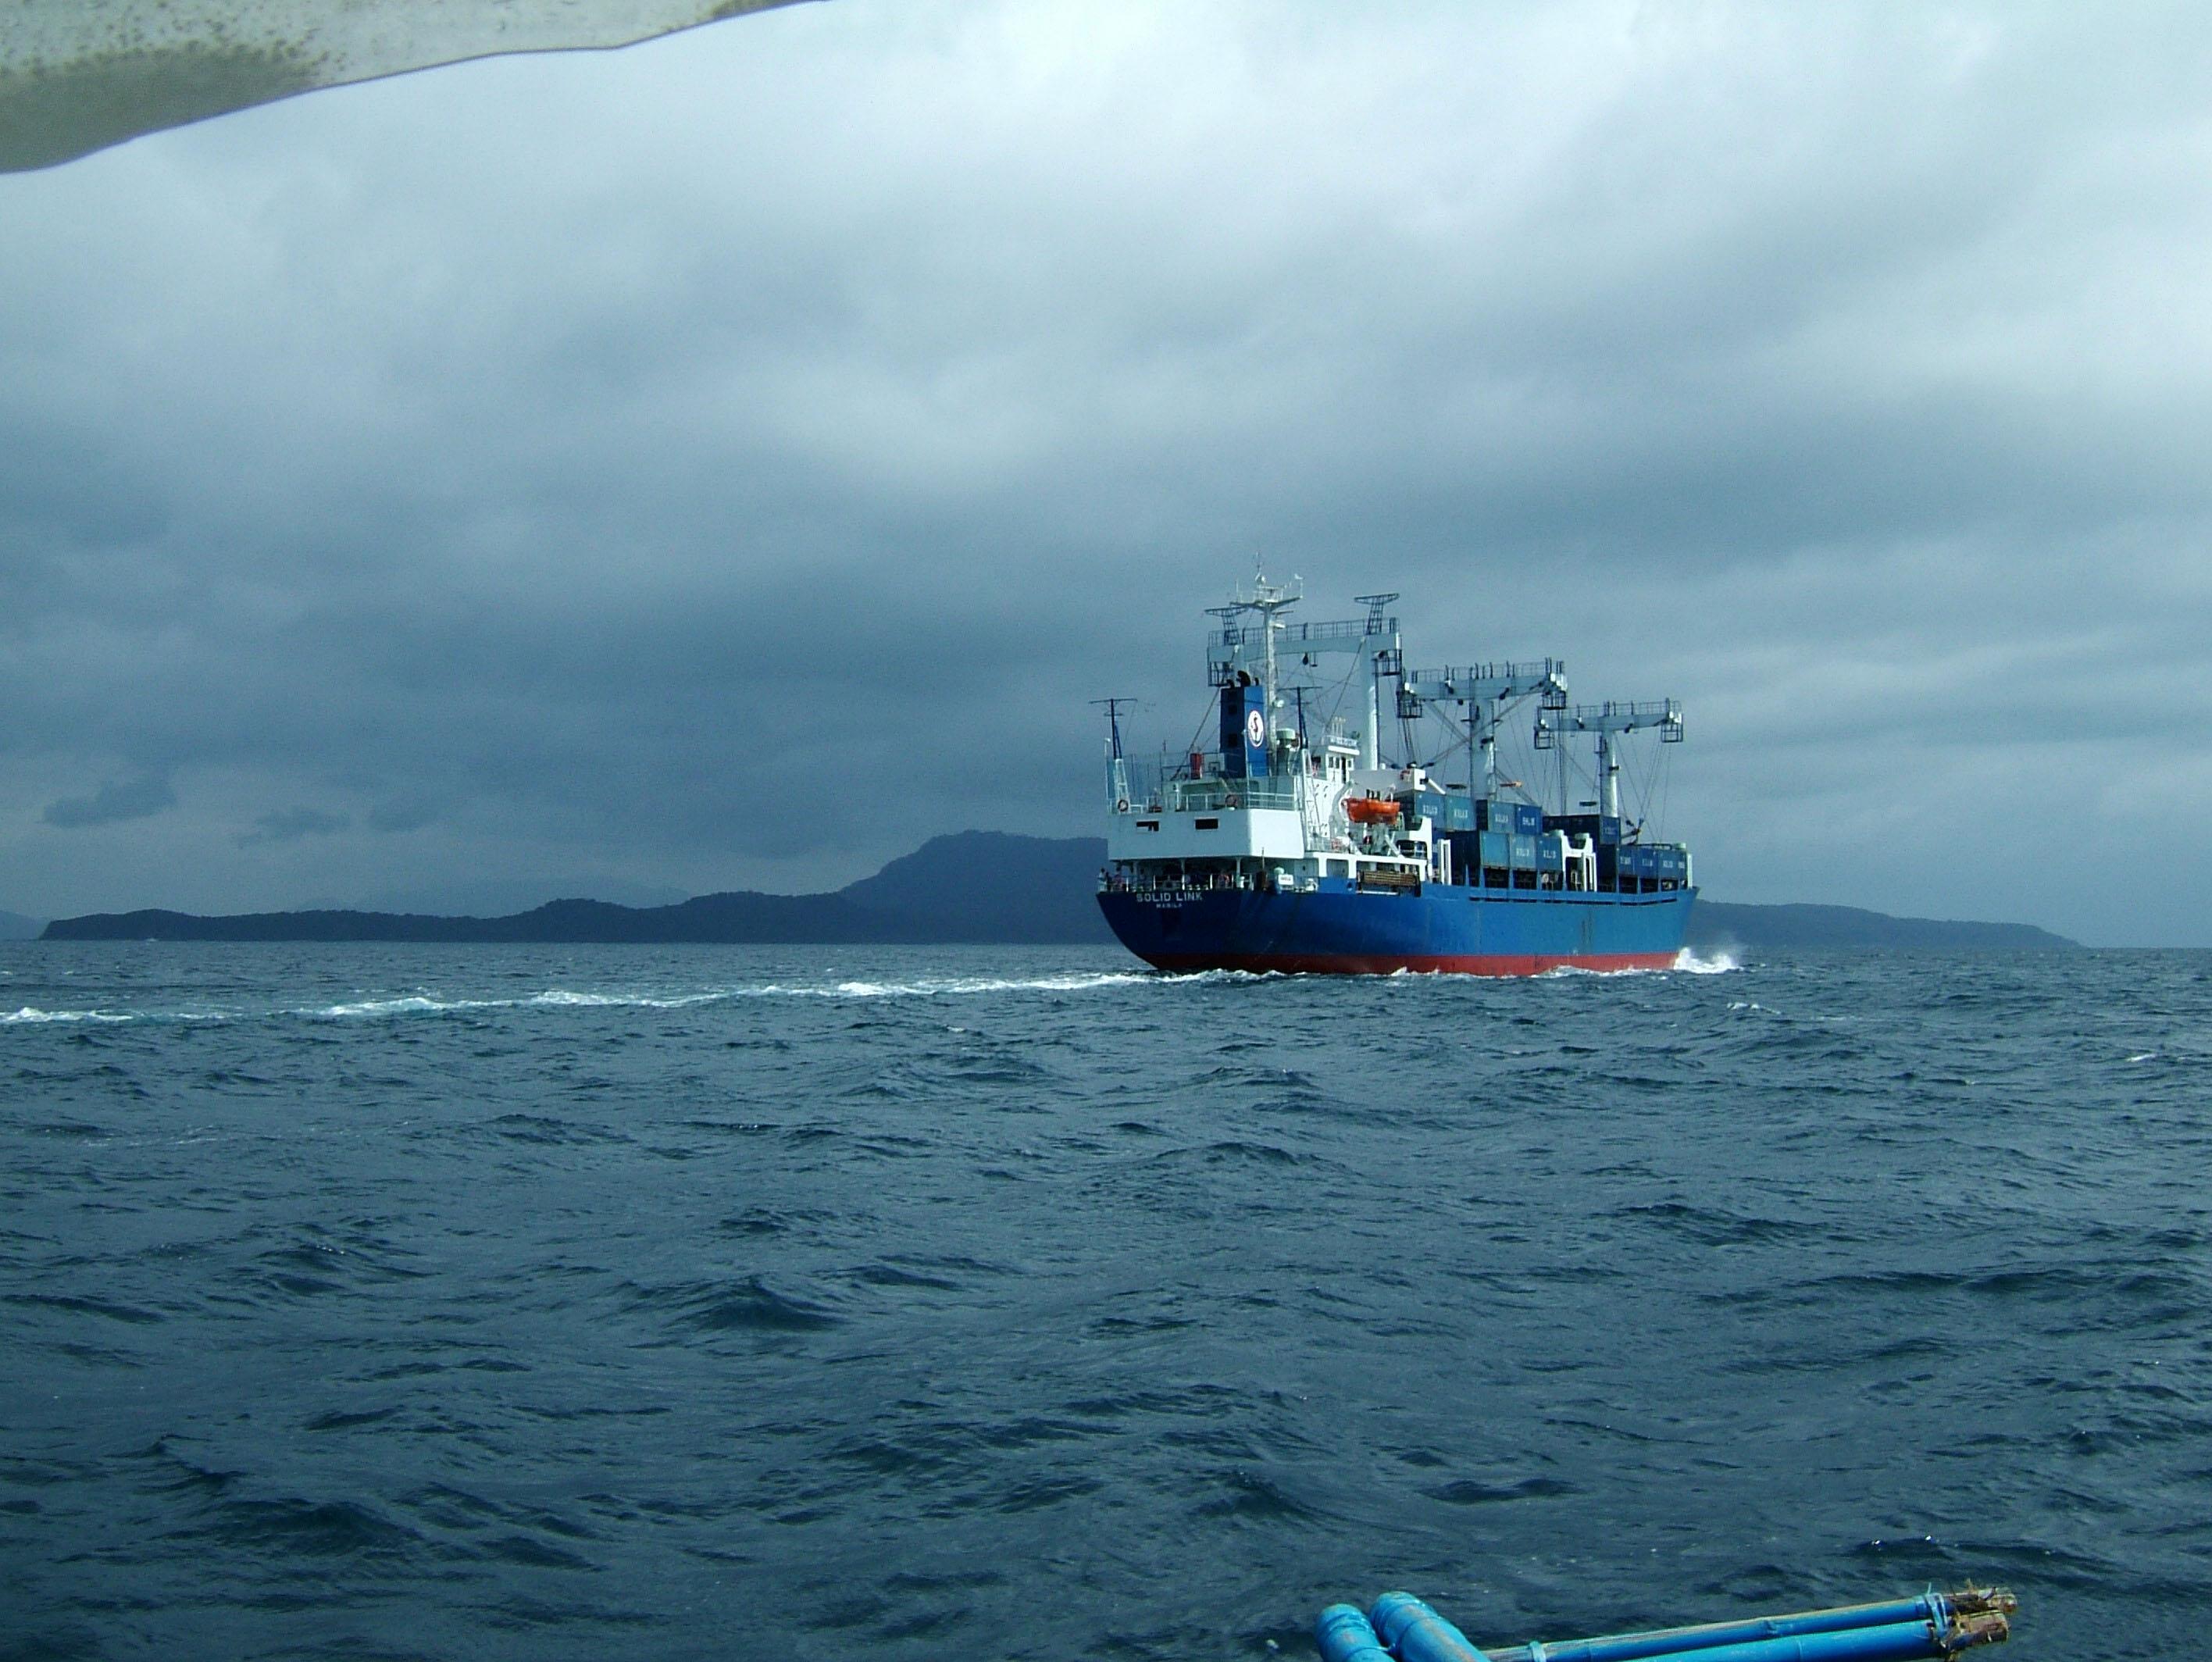 MS Solid Link via Verde Island passage 04